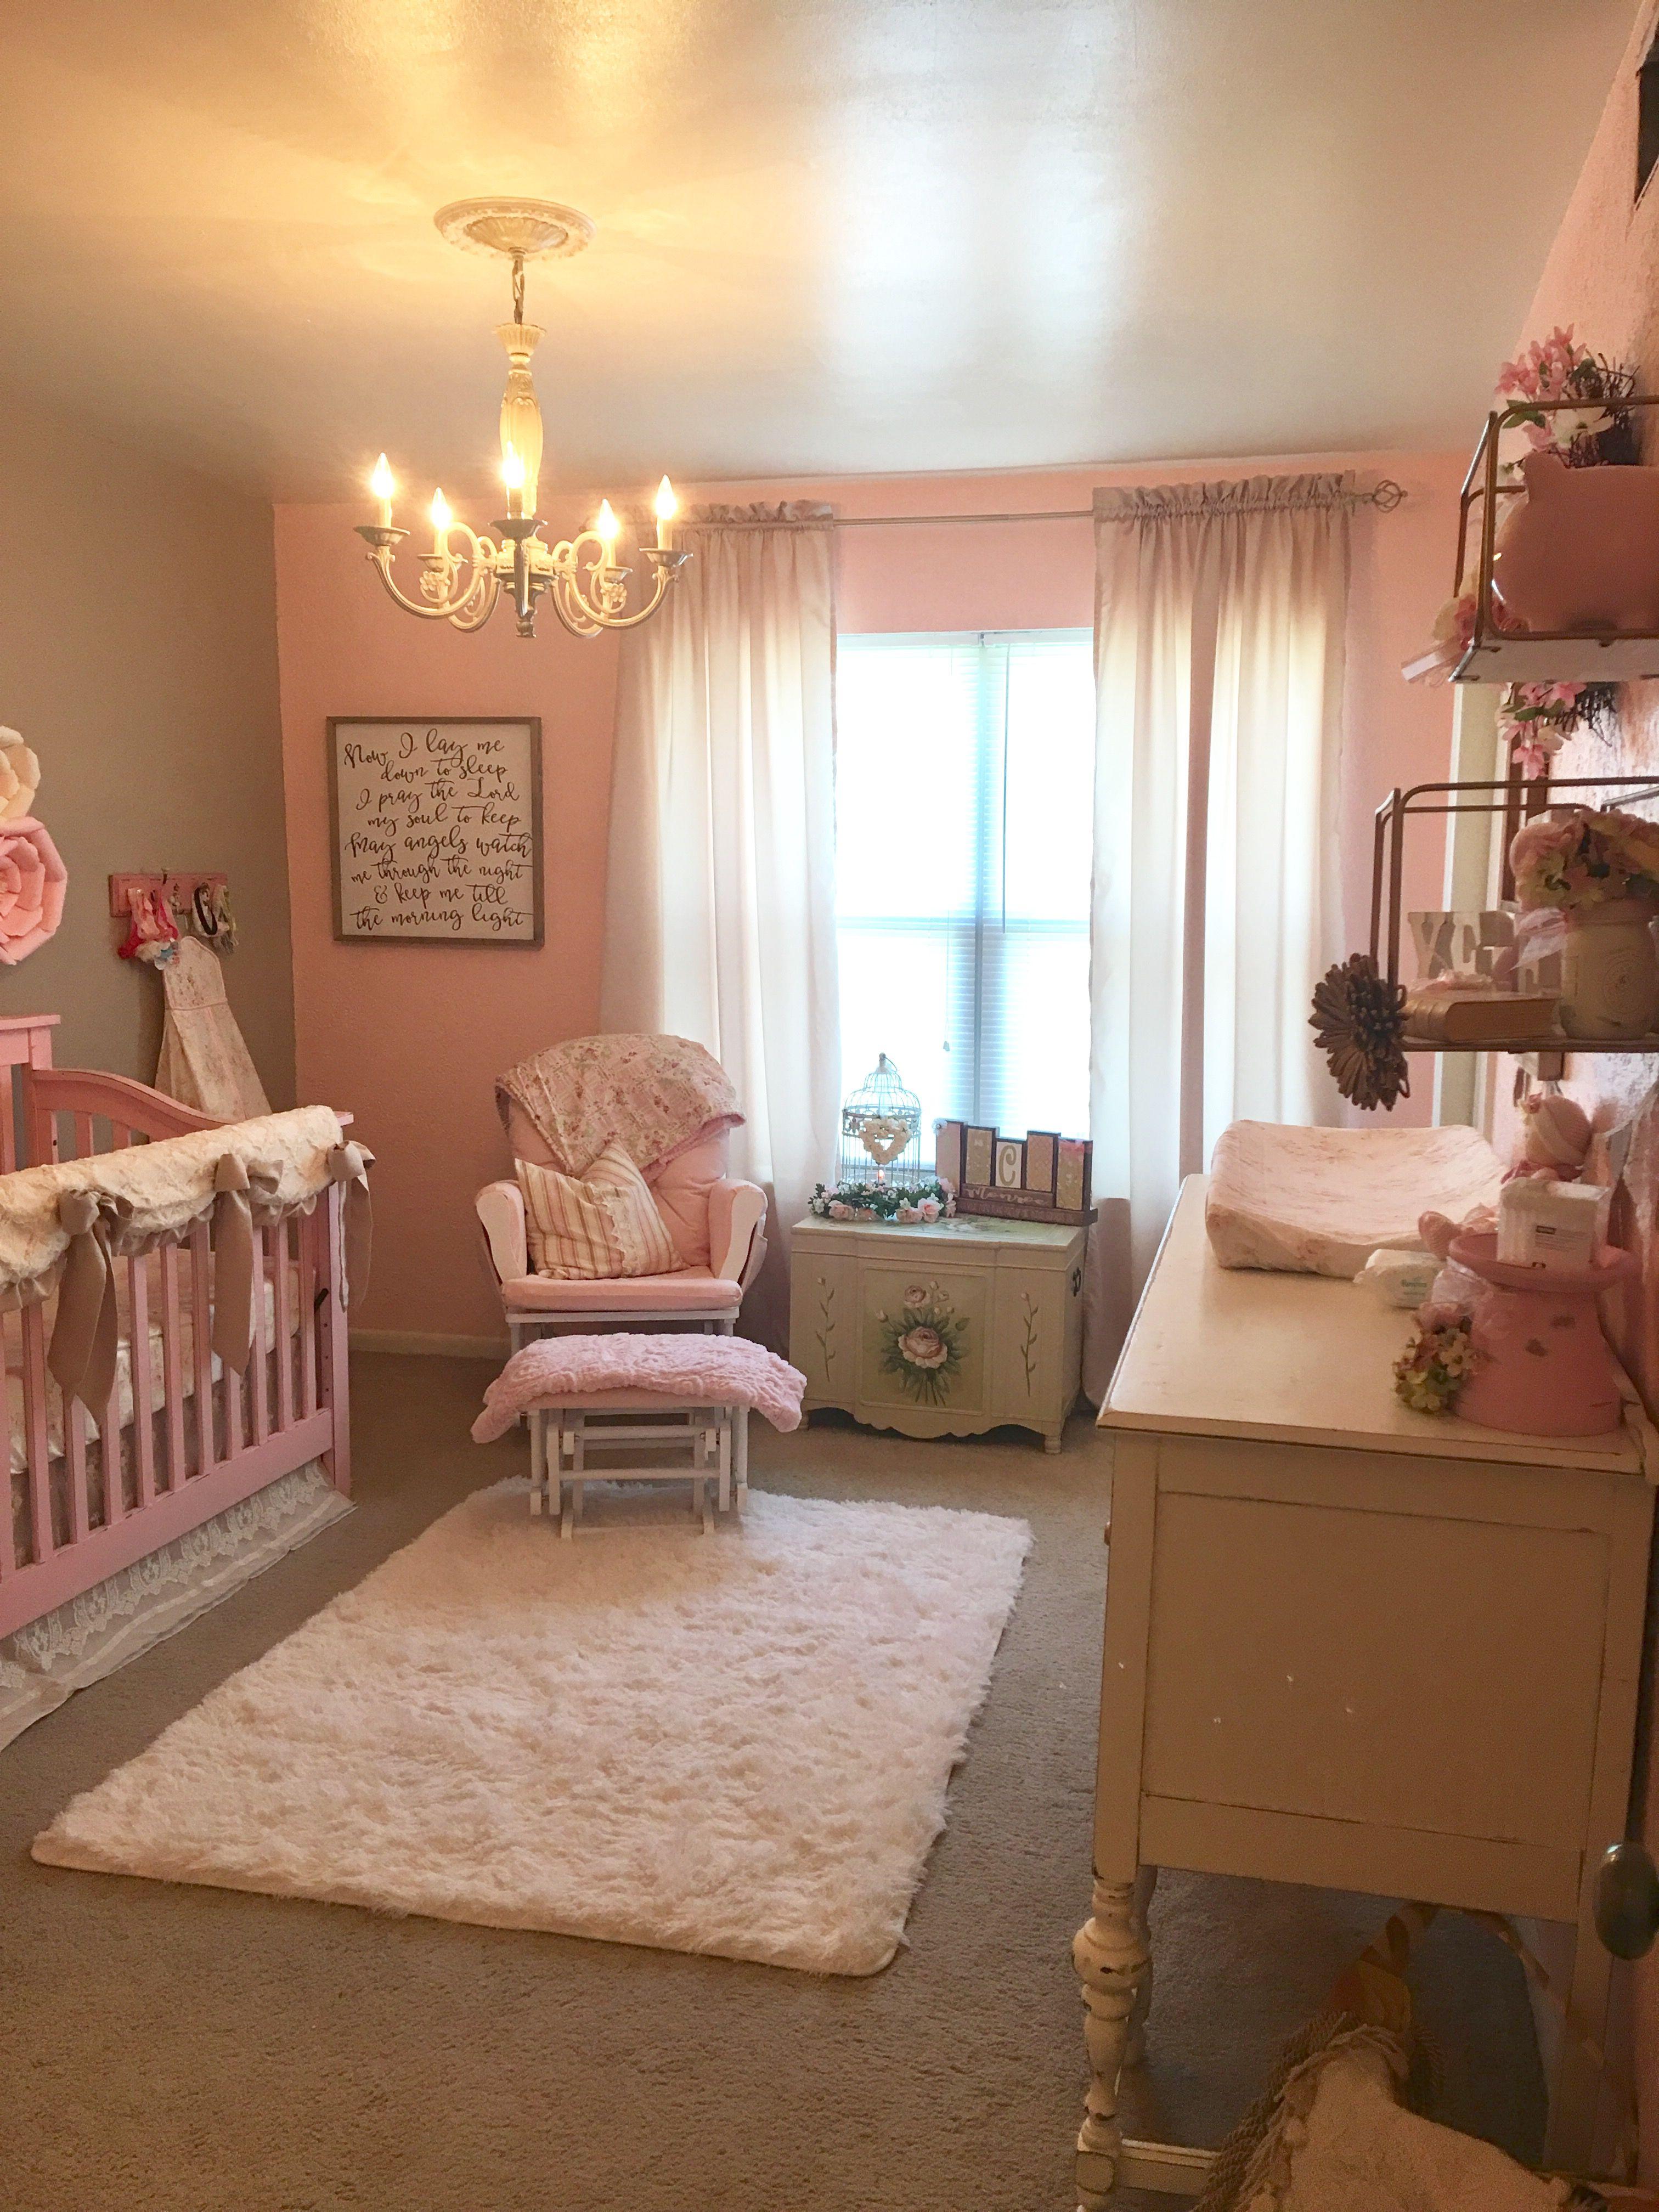 Shabby Chic Nursery Babygirlnursery Nursery Shabby Chic Nursery Girl Shabby Chic Baby Nursery Chic Nursery Girl